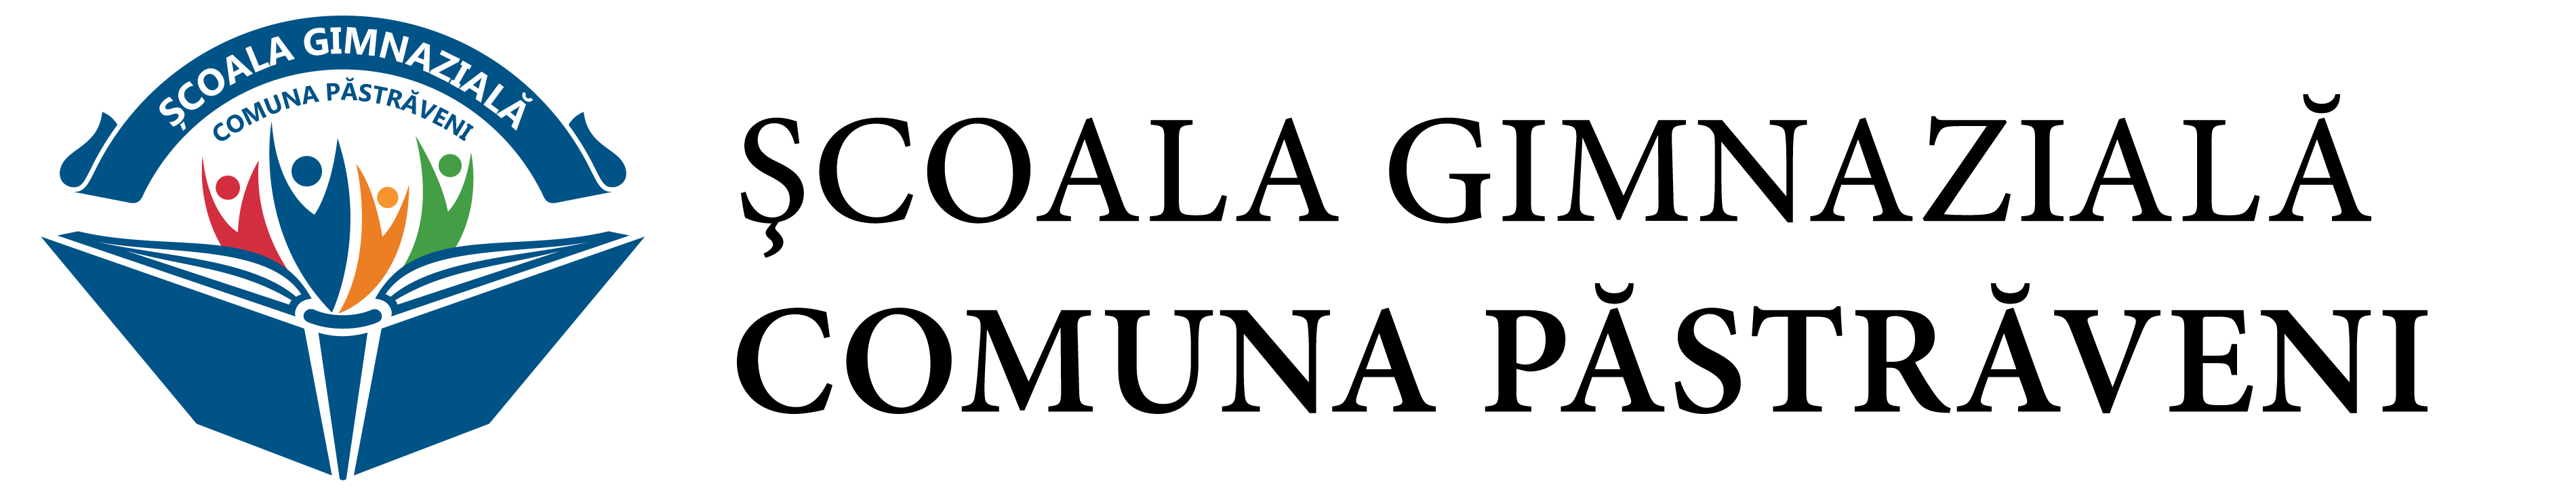 Logo-Scoala-Gimnaziala-Comuna-Pastraveni